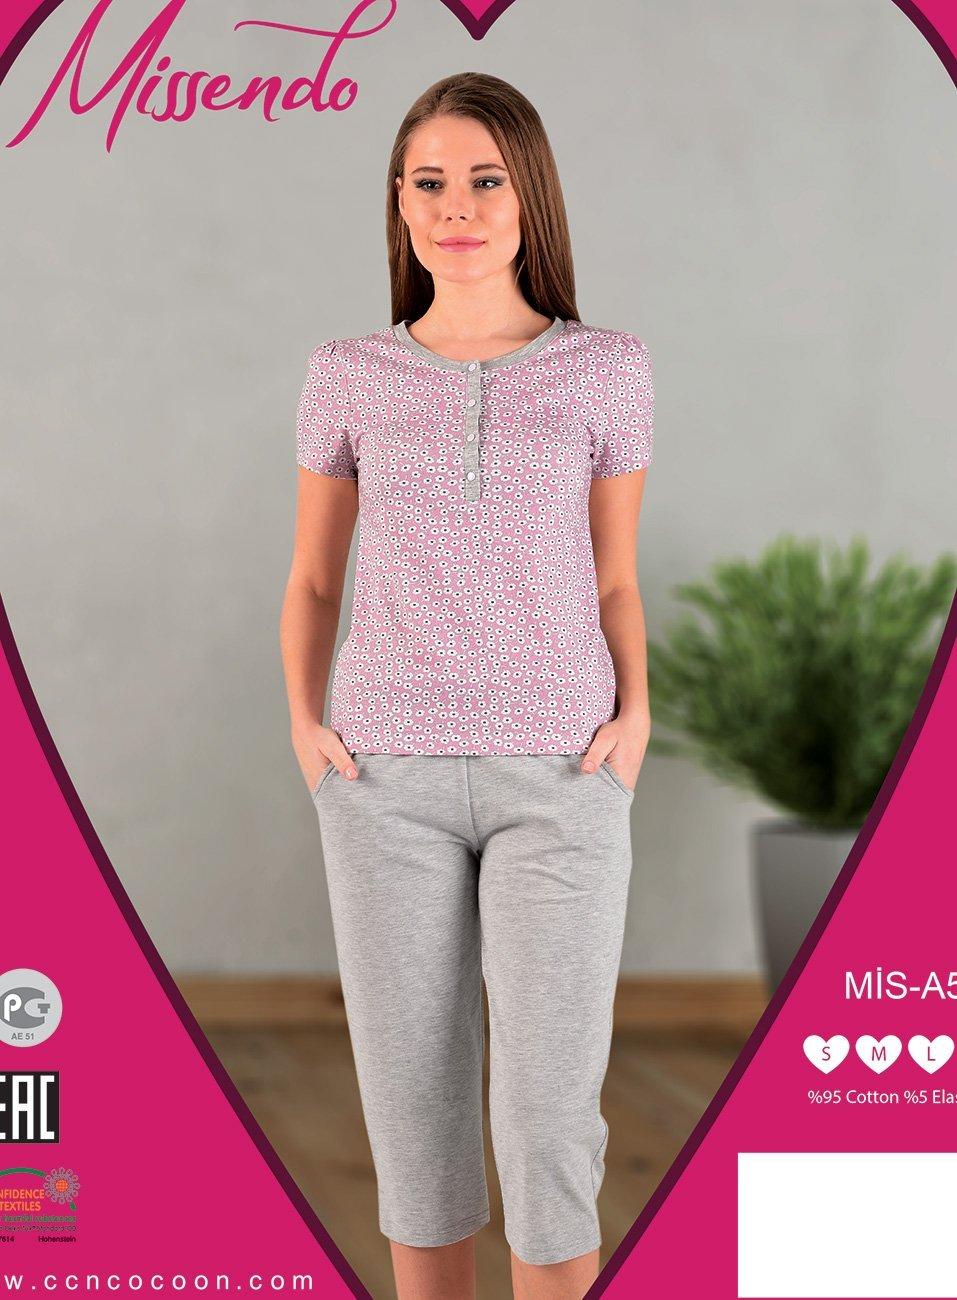 A-509 Цветочки - комплект (футболка+бриджи) Missendo